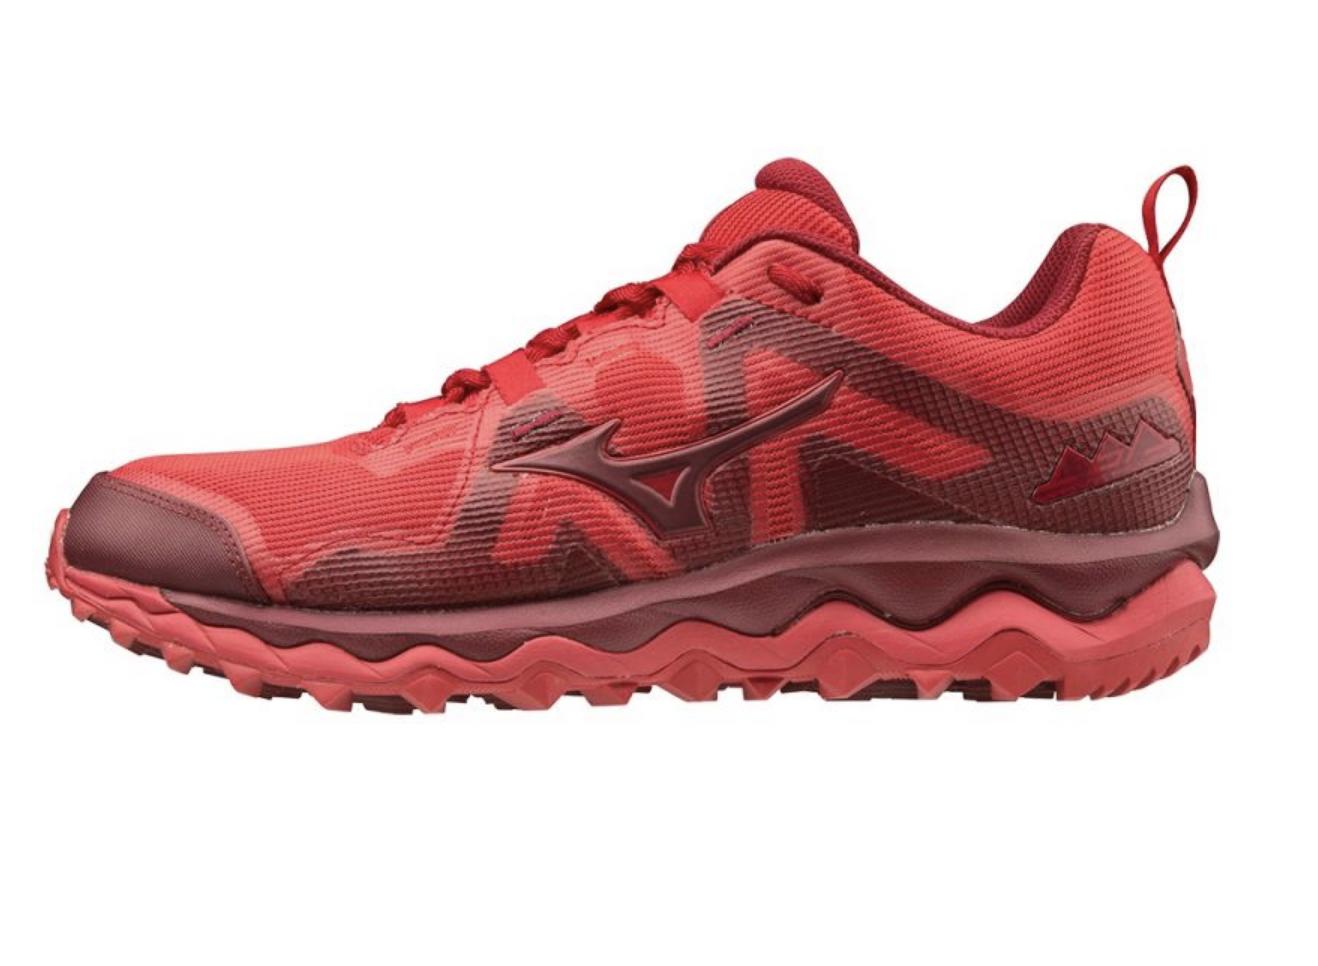 Chaussures trail homme Mizuno Wave Mujin 6